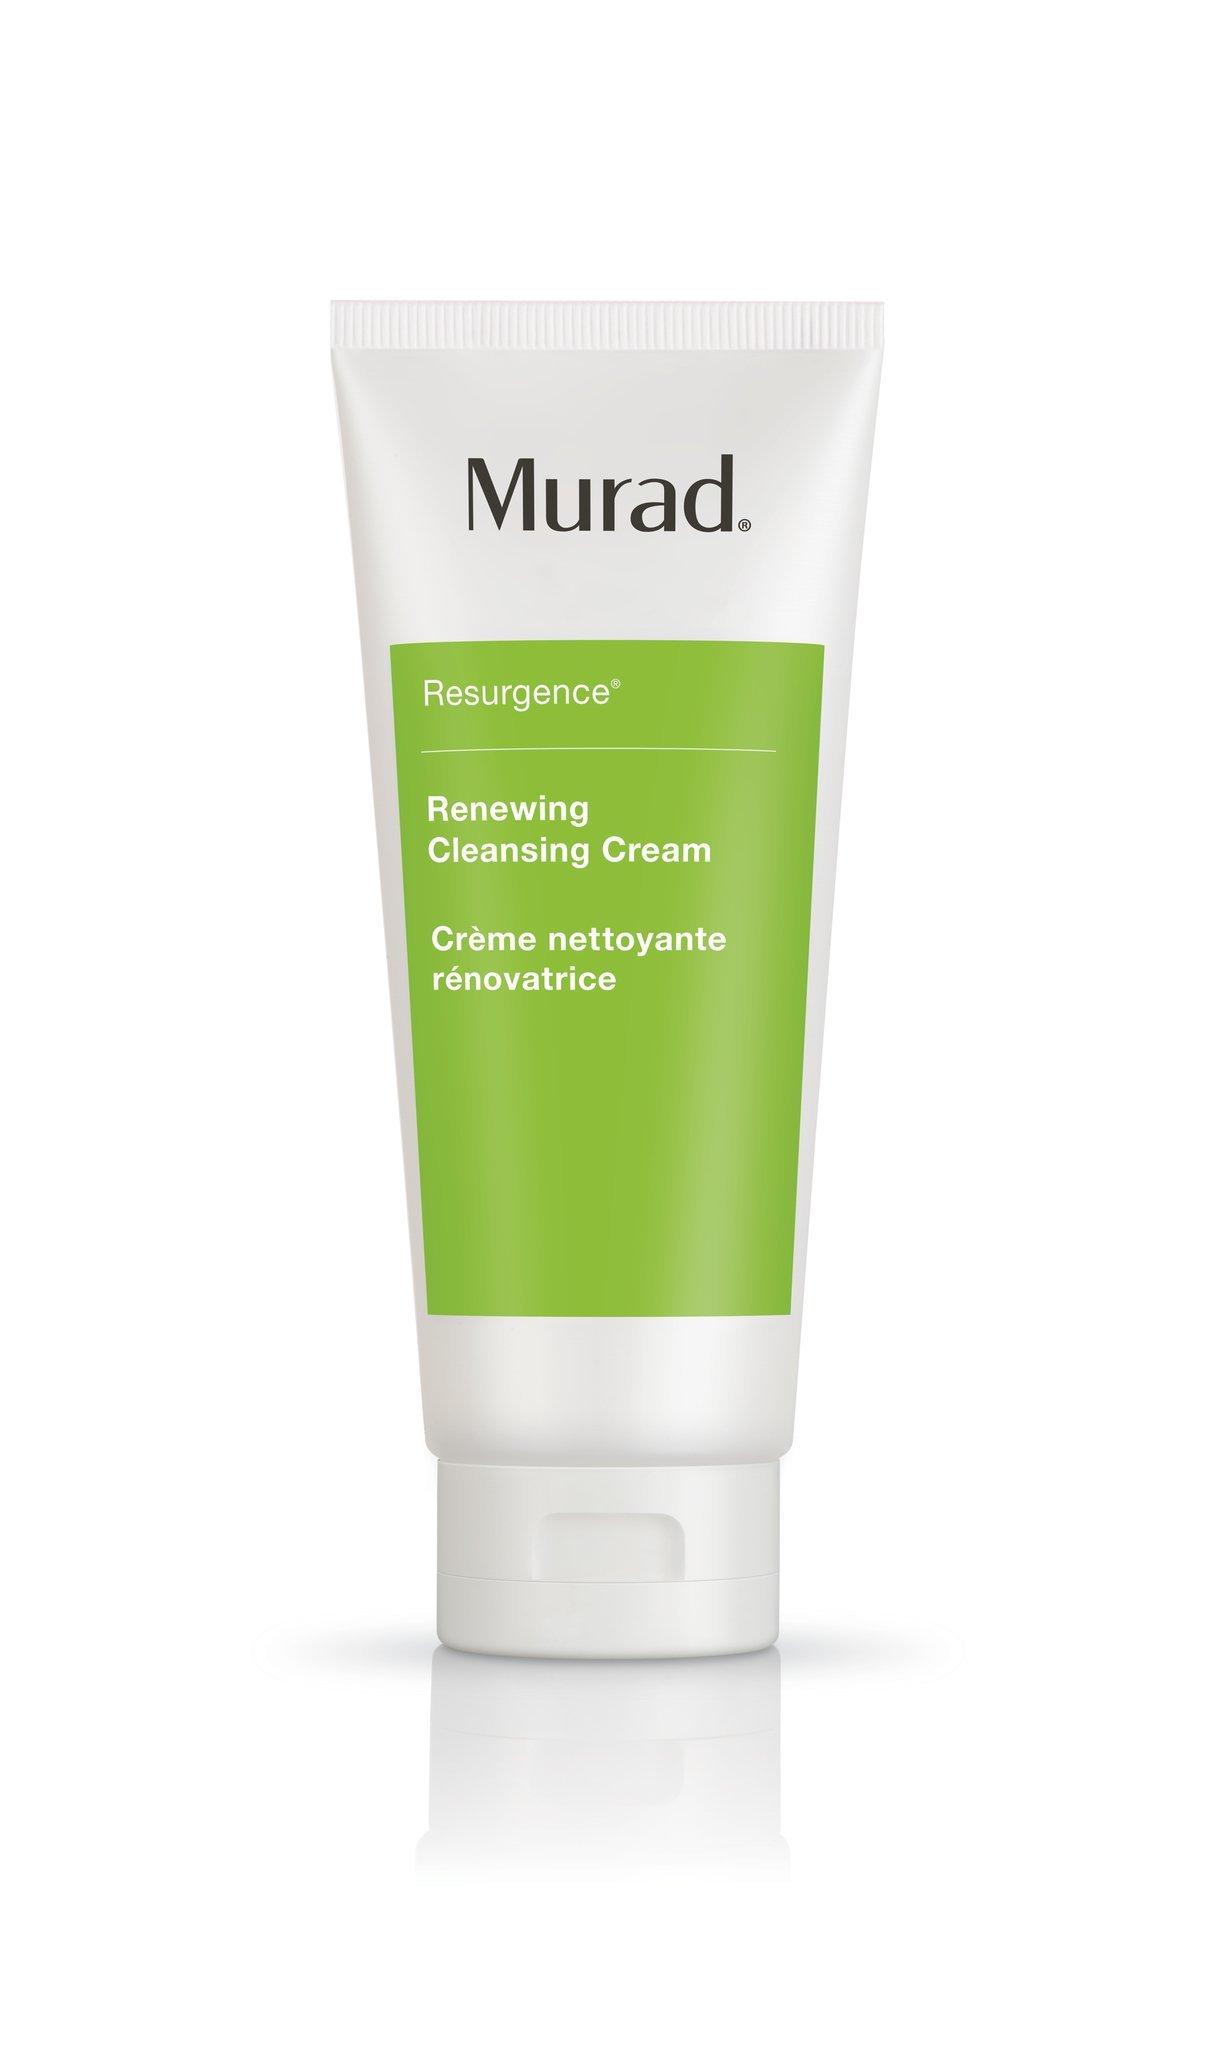 Murad Resurgence Renewing Cleansing Cream, 1: Cleanse/Tone, 6.75 fl oz (200 ml)